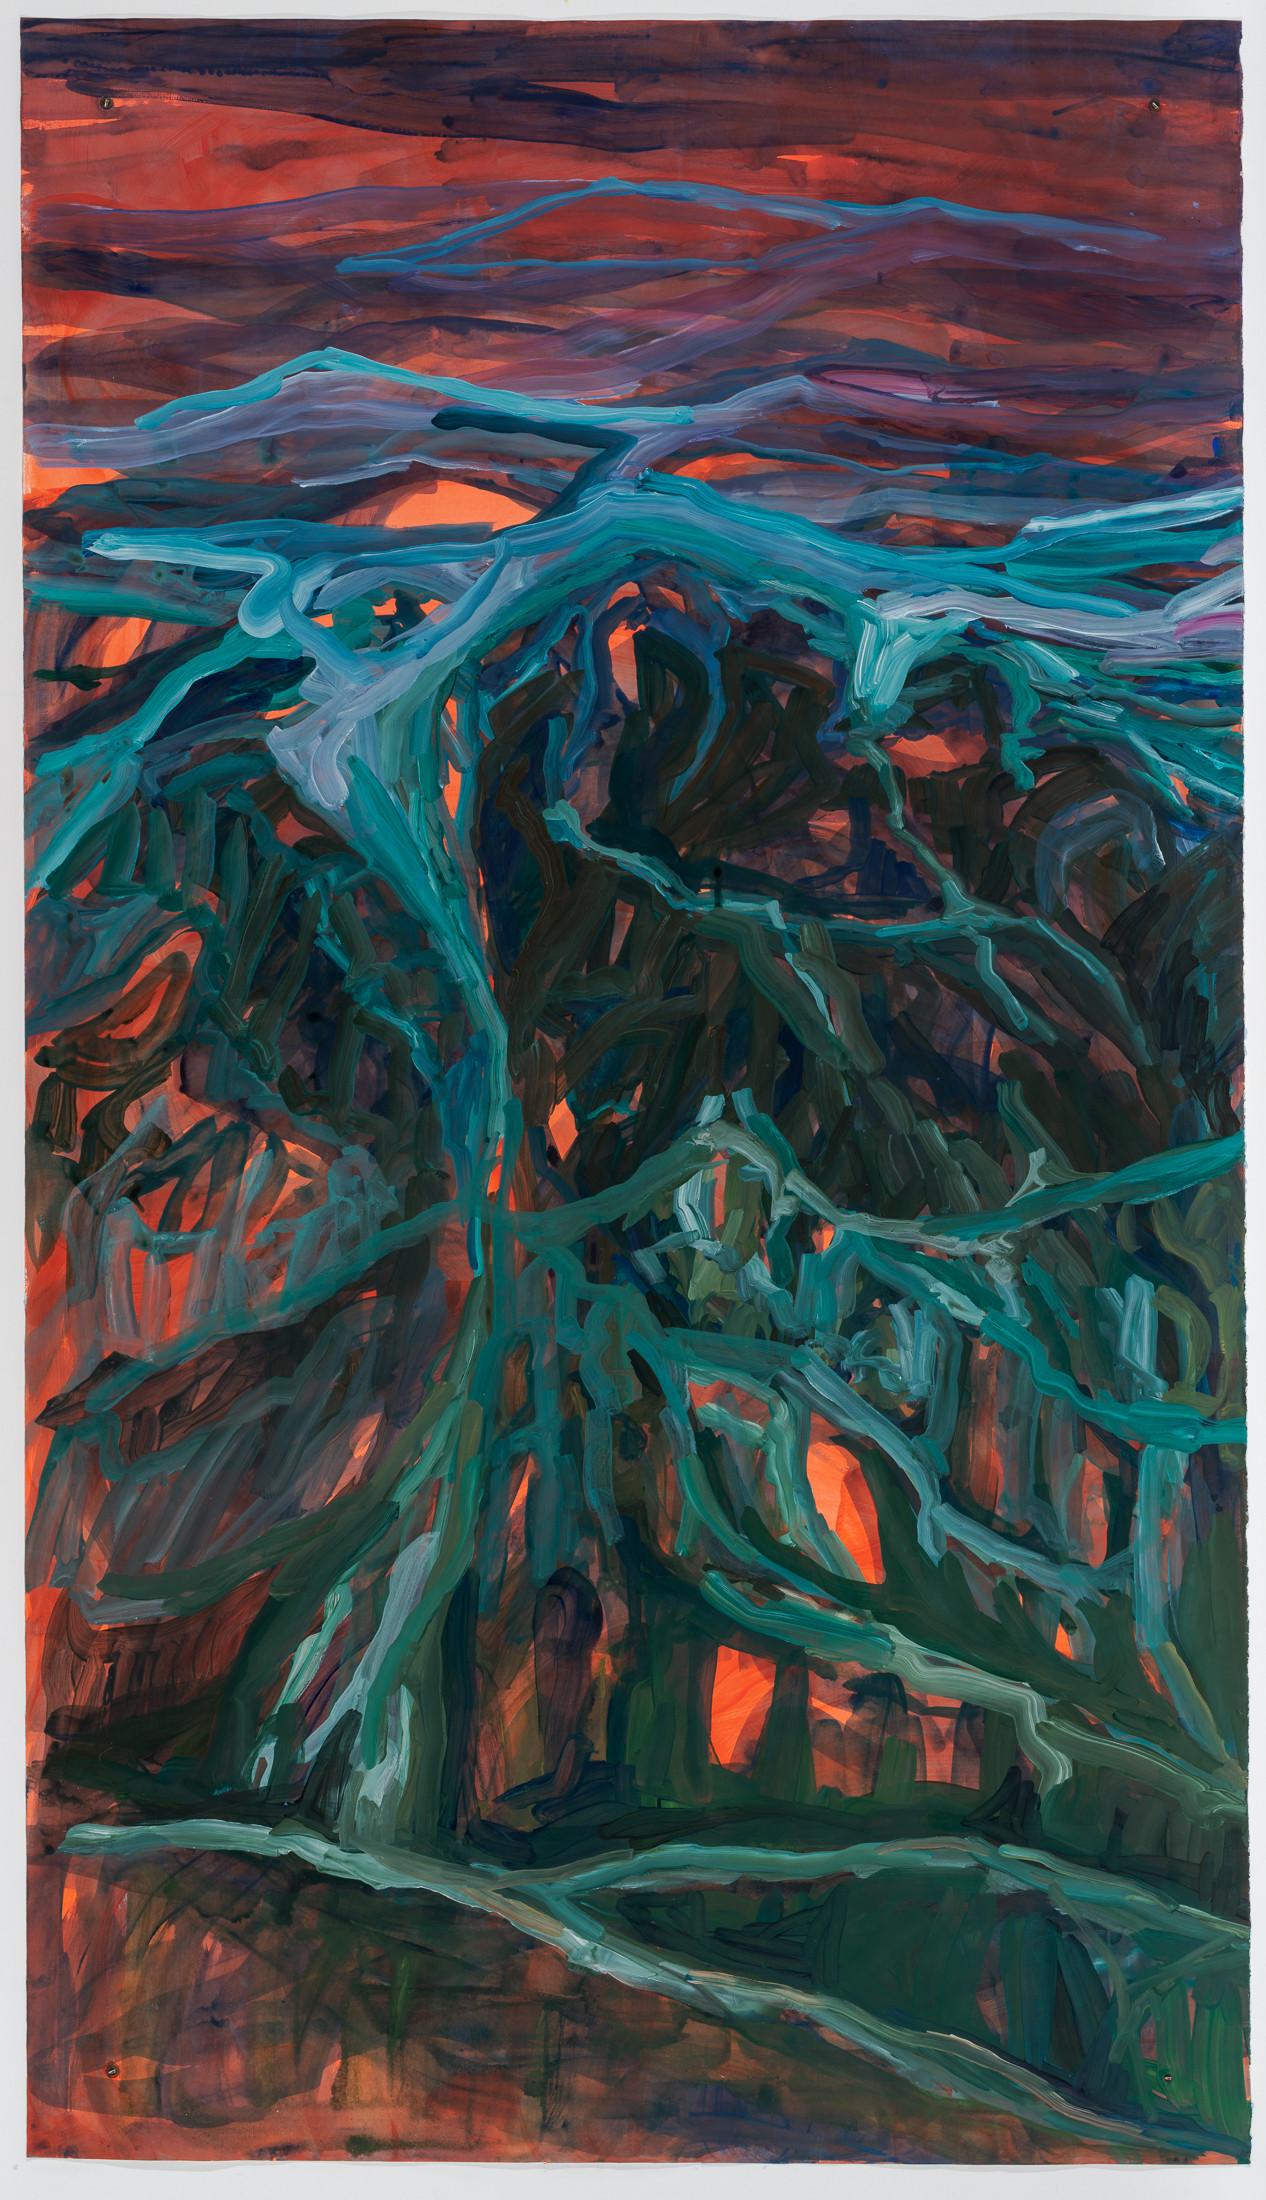 Liquid Sand, acrylic on watercolor paper, 250 x 140 cm DMF 2020